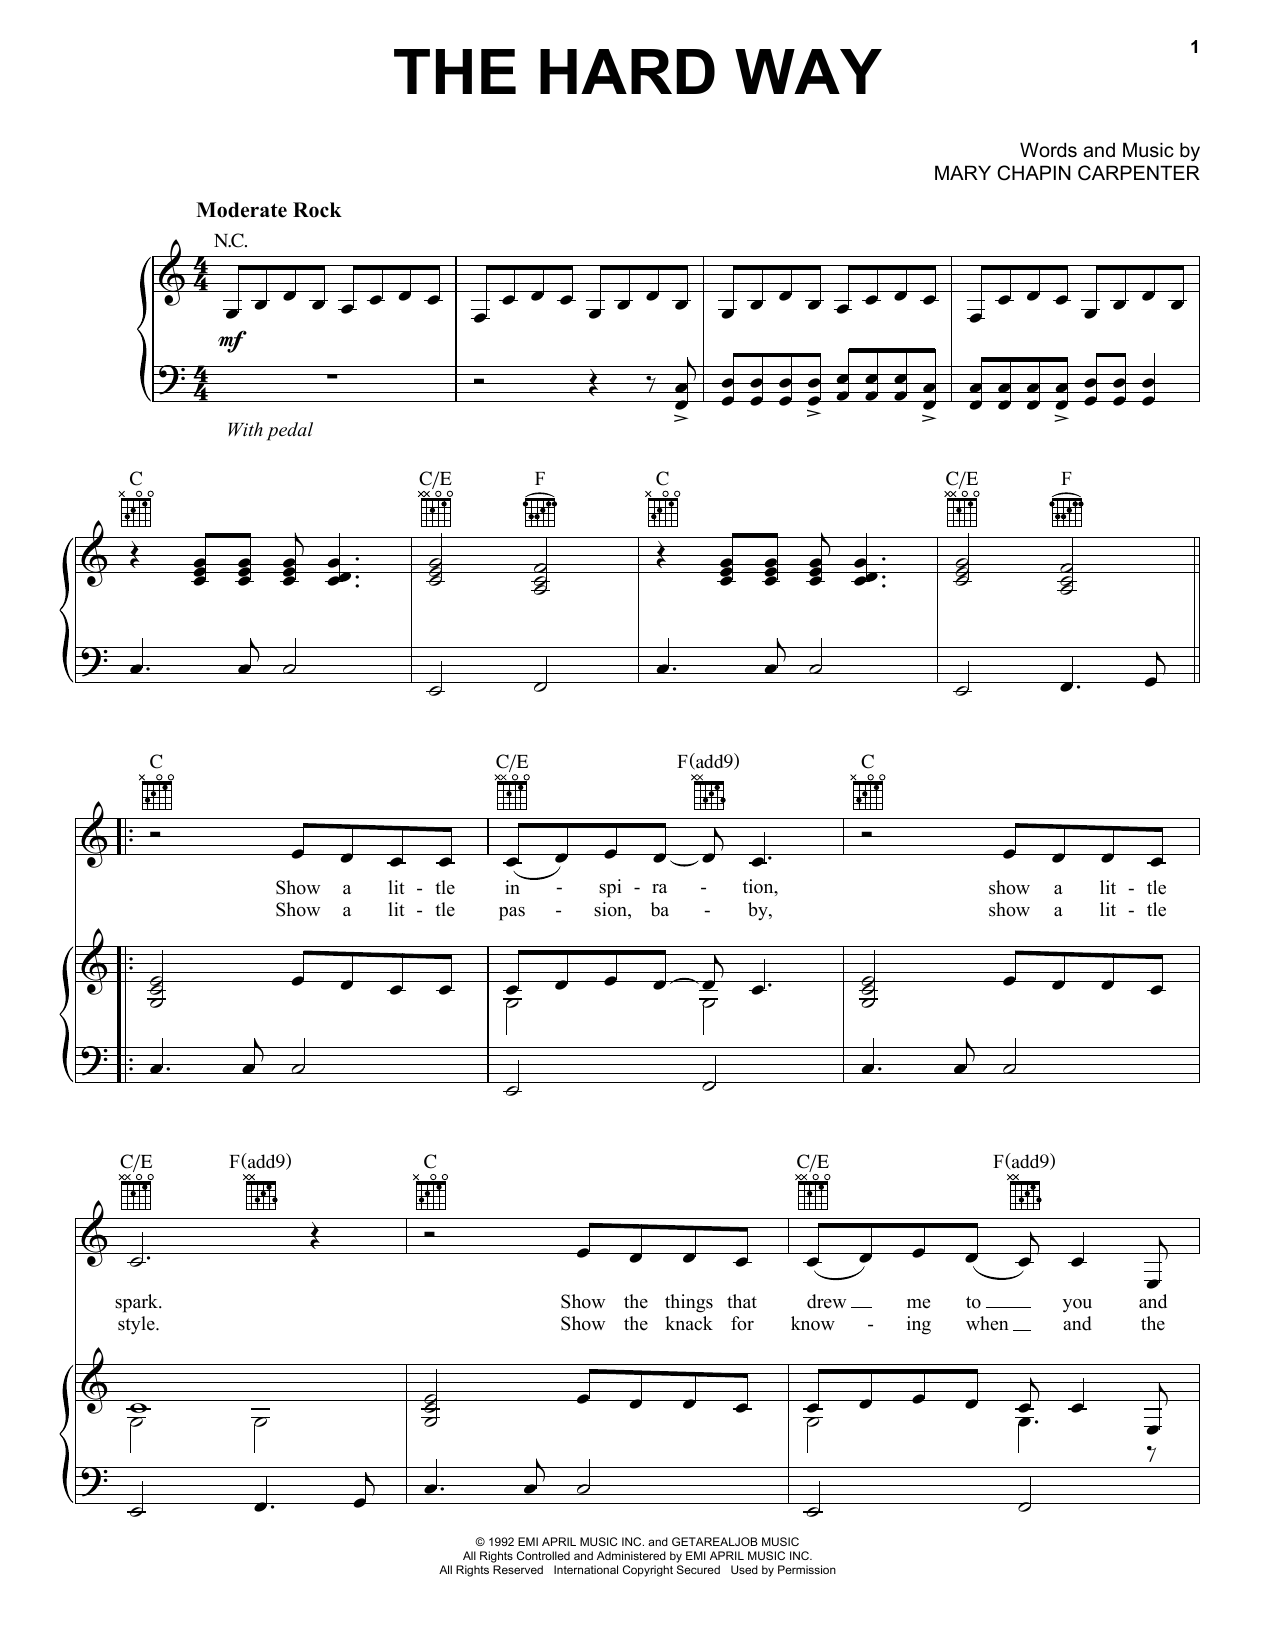 Mary Chapin Carpenter The Hard Way sheet music notes and chords. Download Printable PDF.